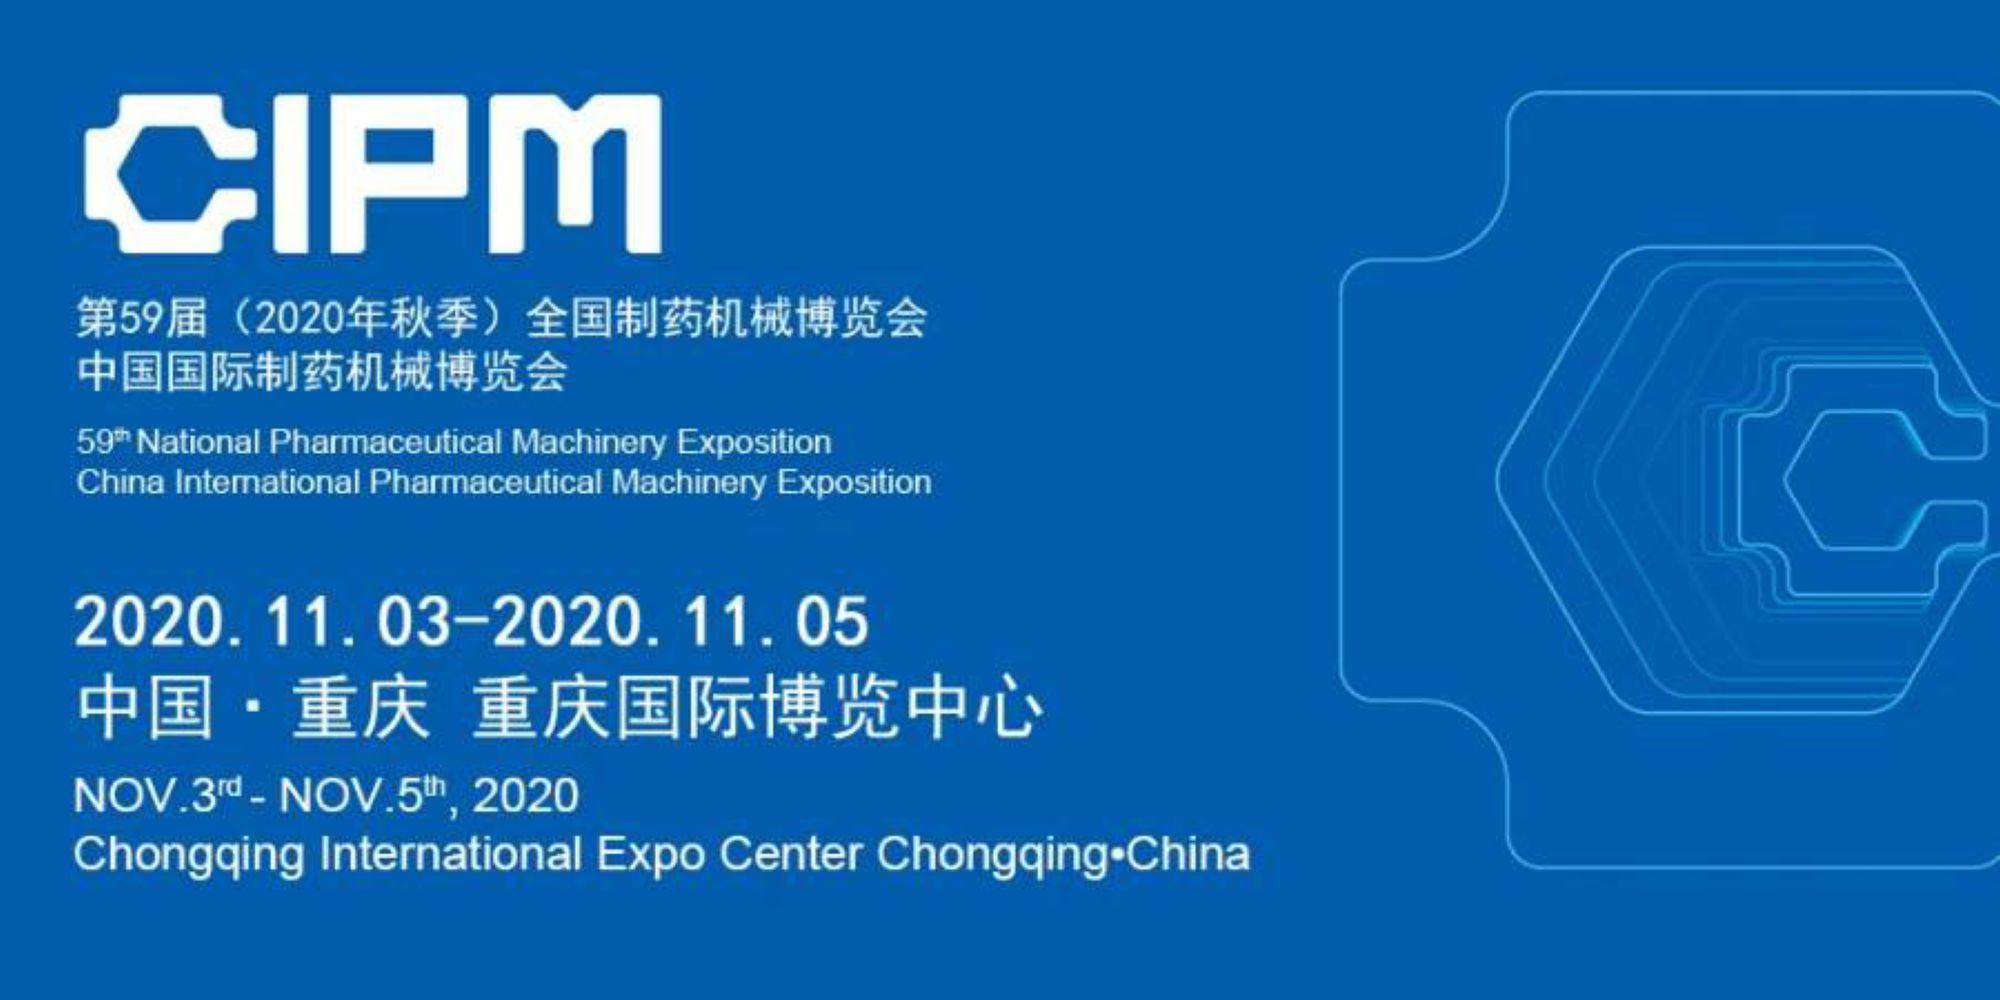 CN_202009_Pharma_tradeshow_CIPM-900X450.jpg